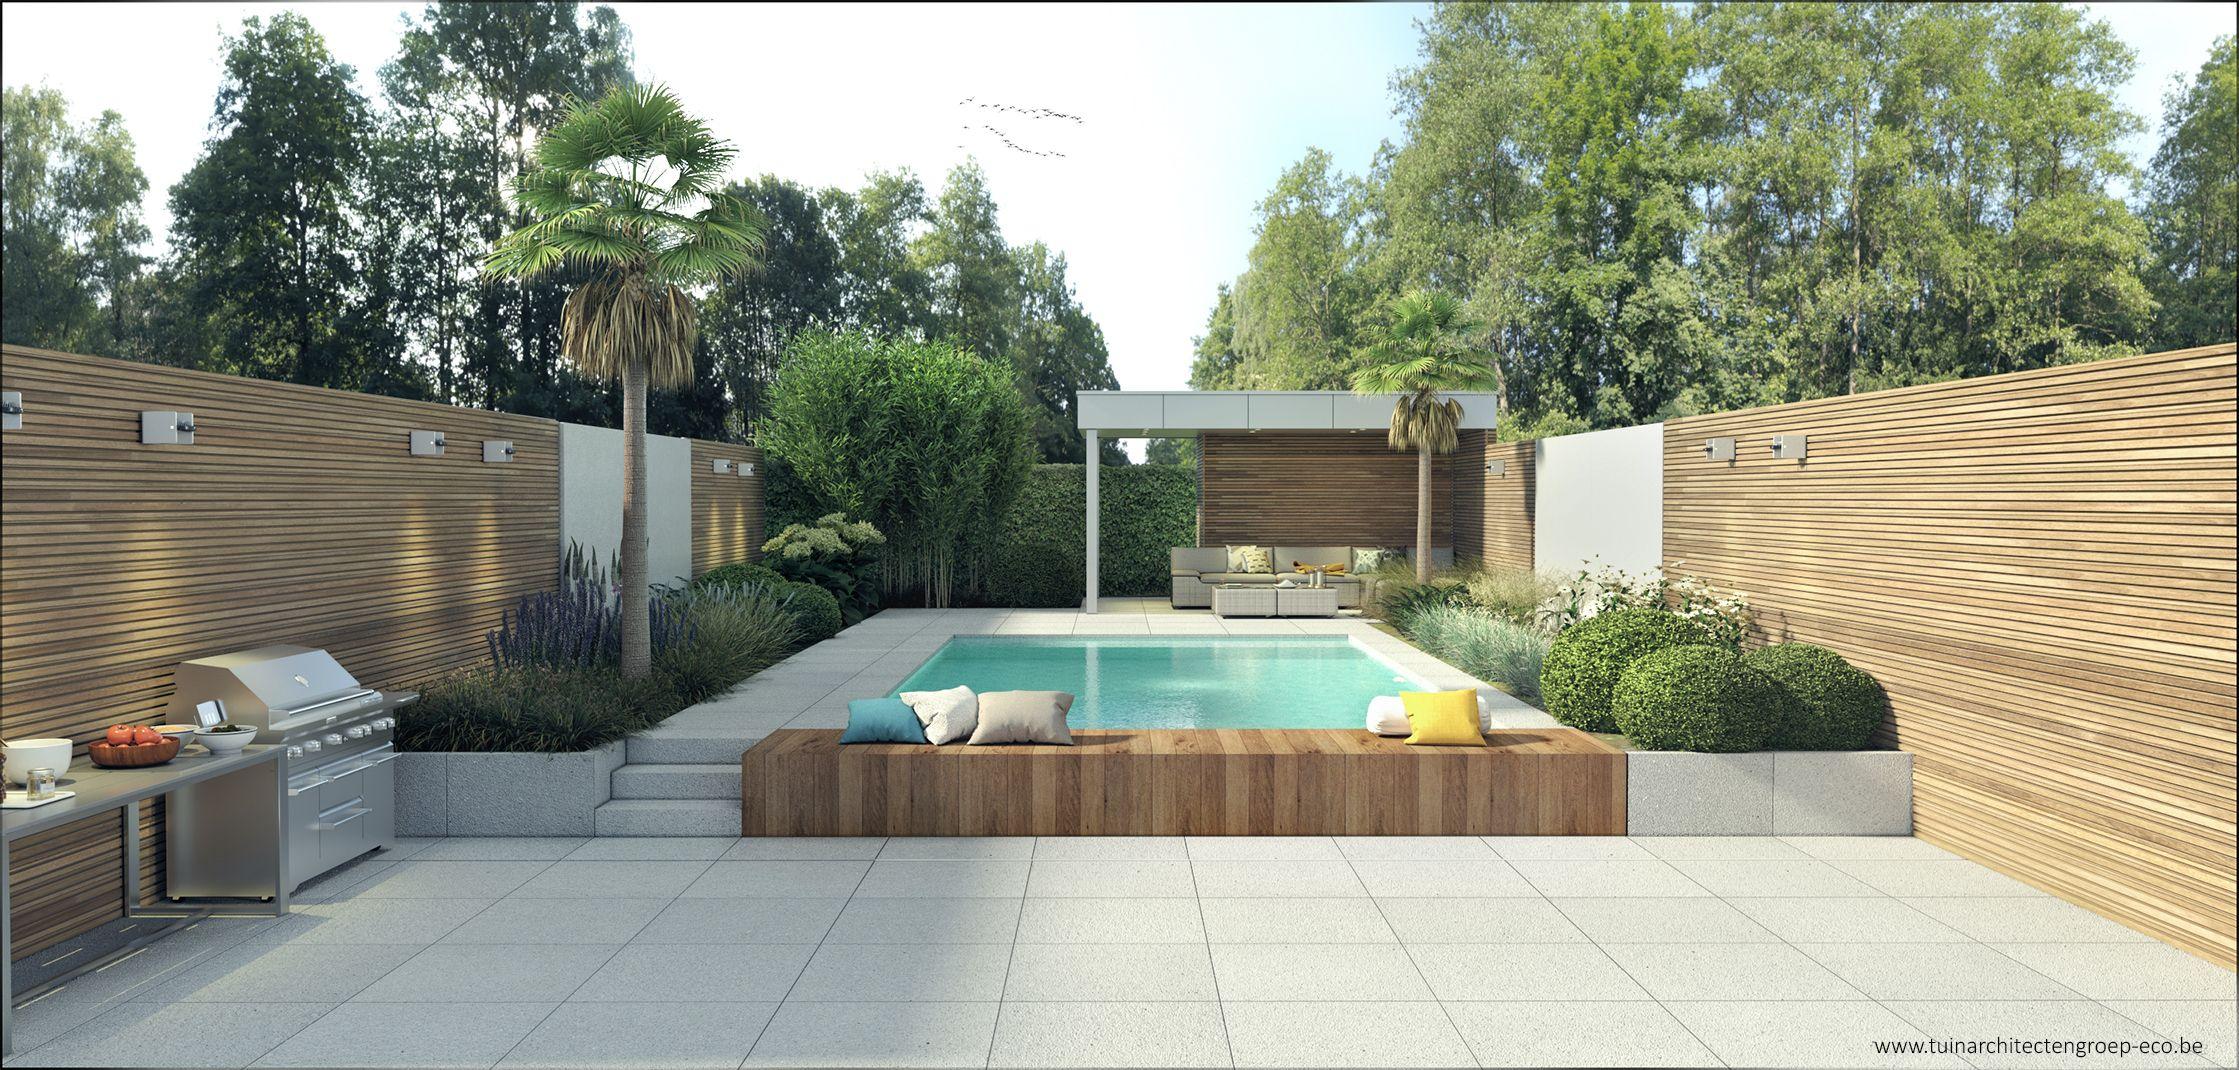 Tuinontwerp moderne tuin temse vakantiegevoel poolhouse for Tuinarchitect modern